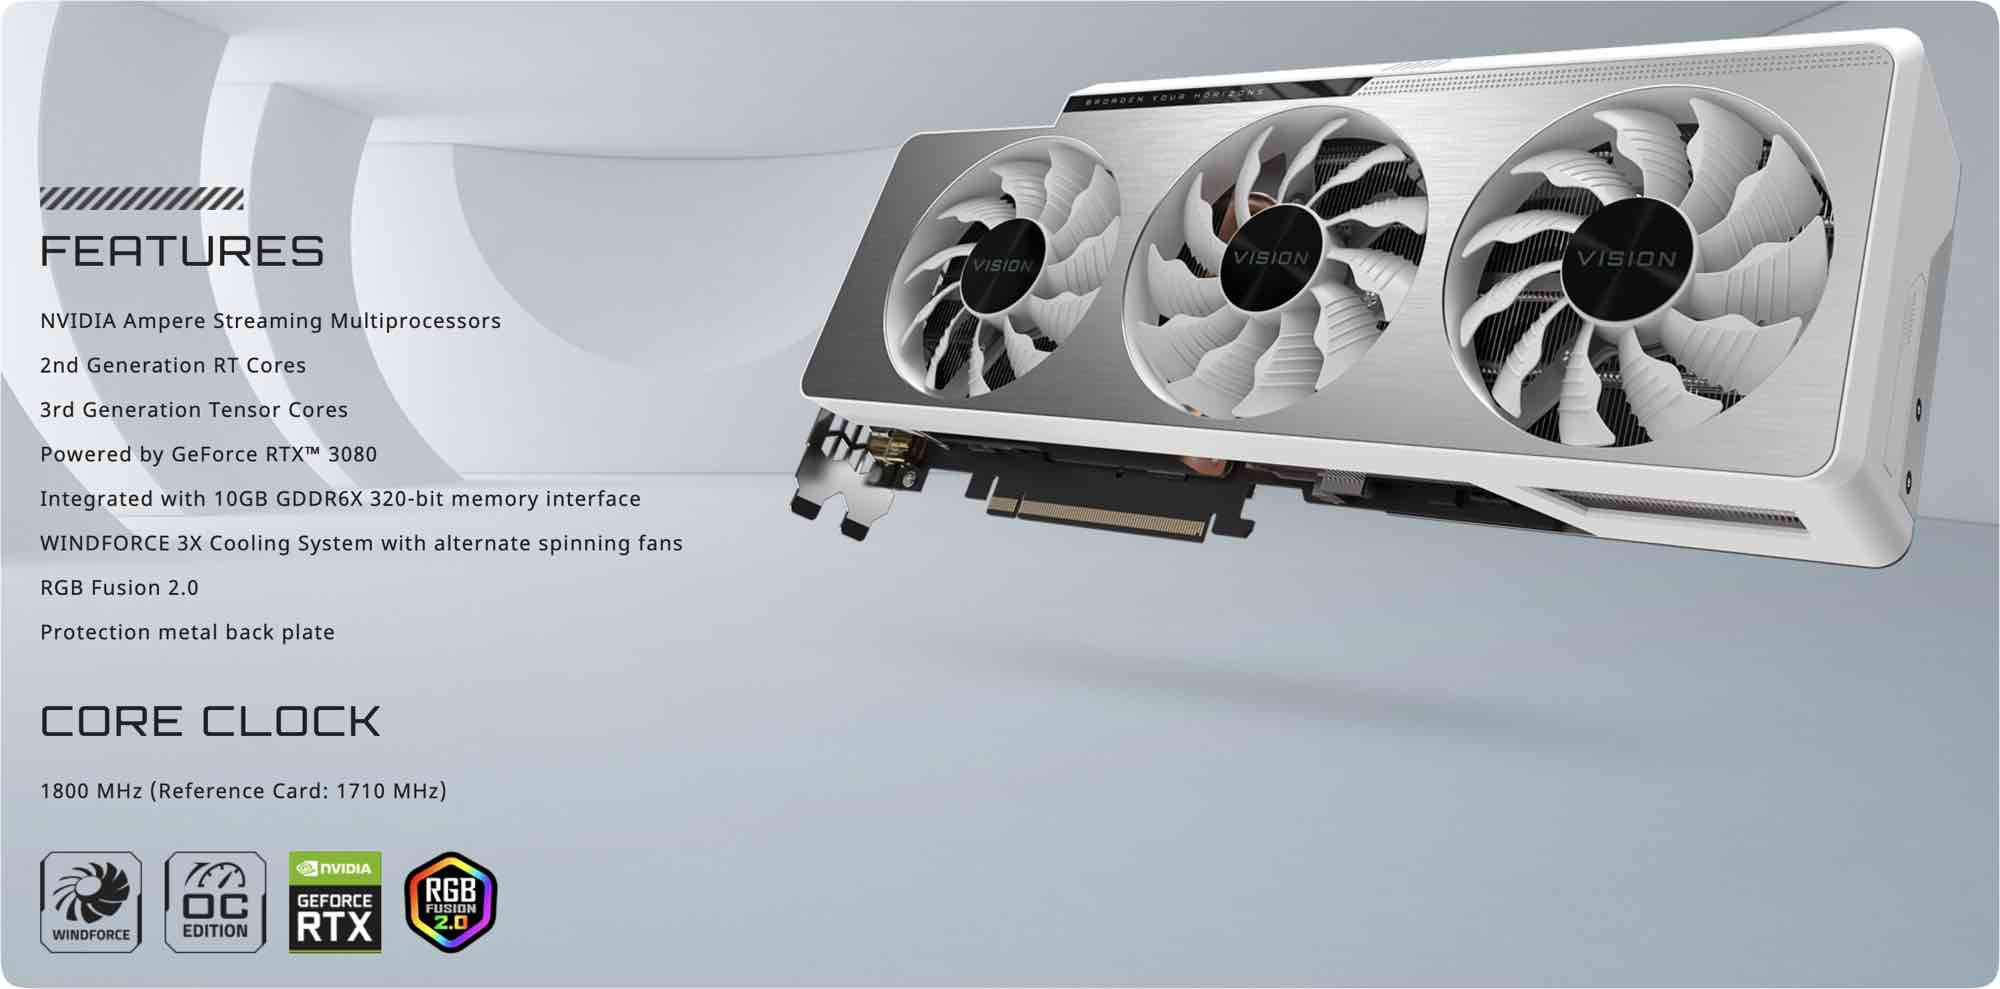 Gigabyte nVidia GeForce RTX 3080 VISION OC 10G description